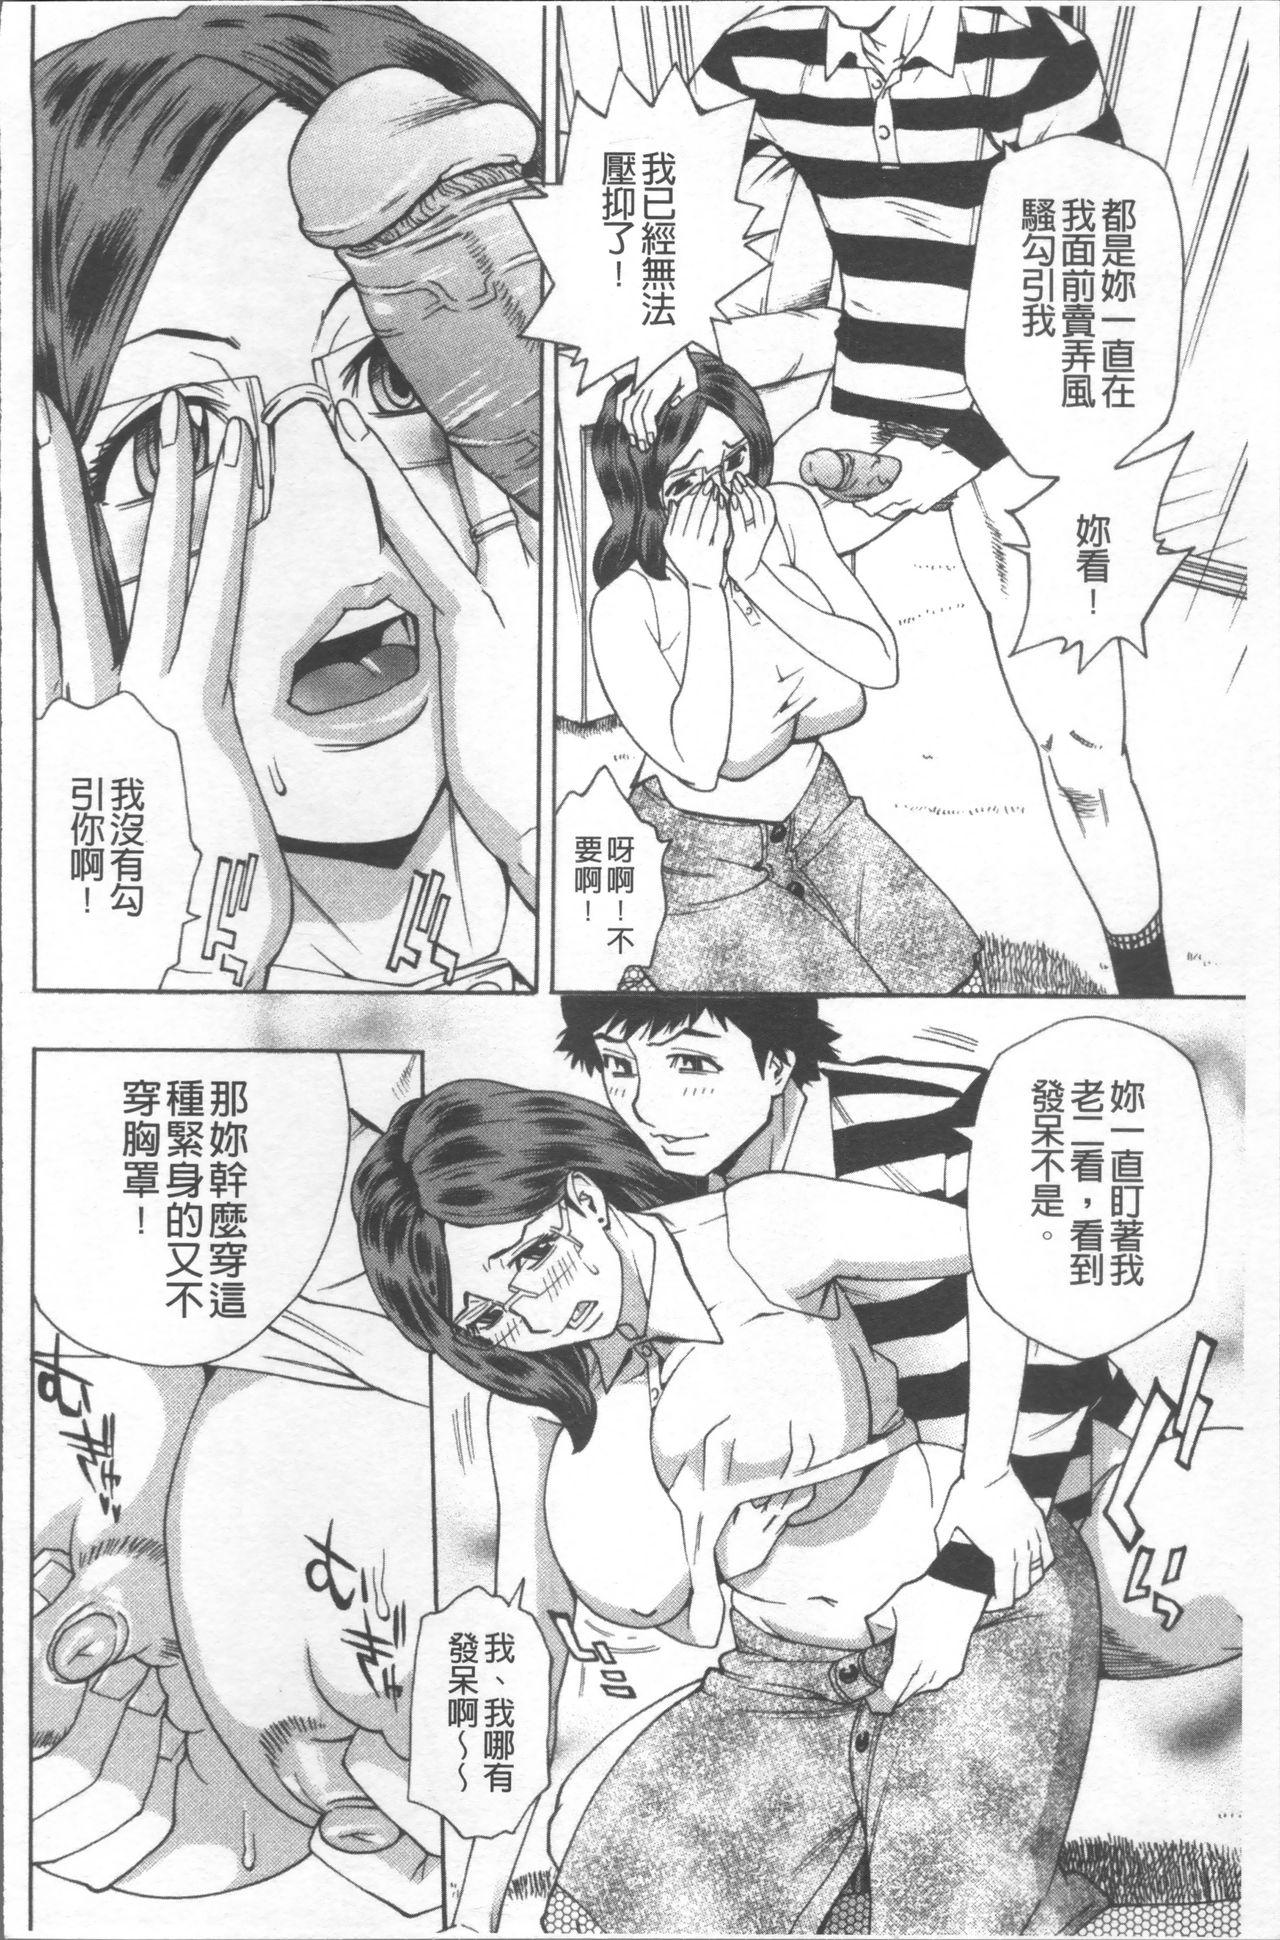 Hitozuma Kanshasai - SUPER EROTIC WIFE'S FESTIVAL 29